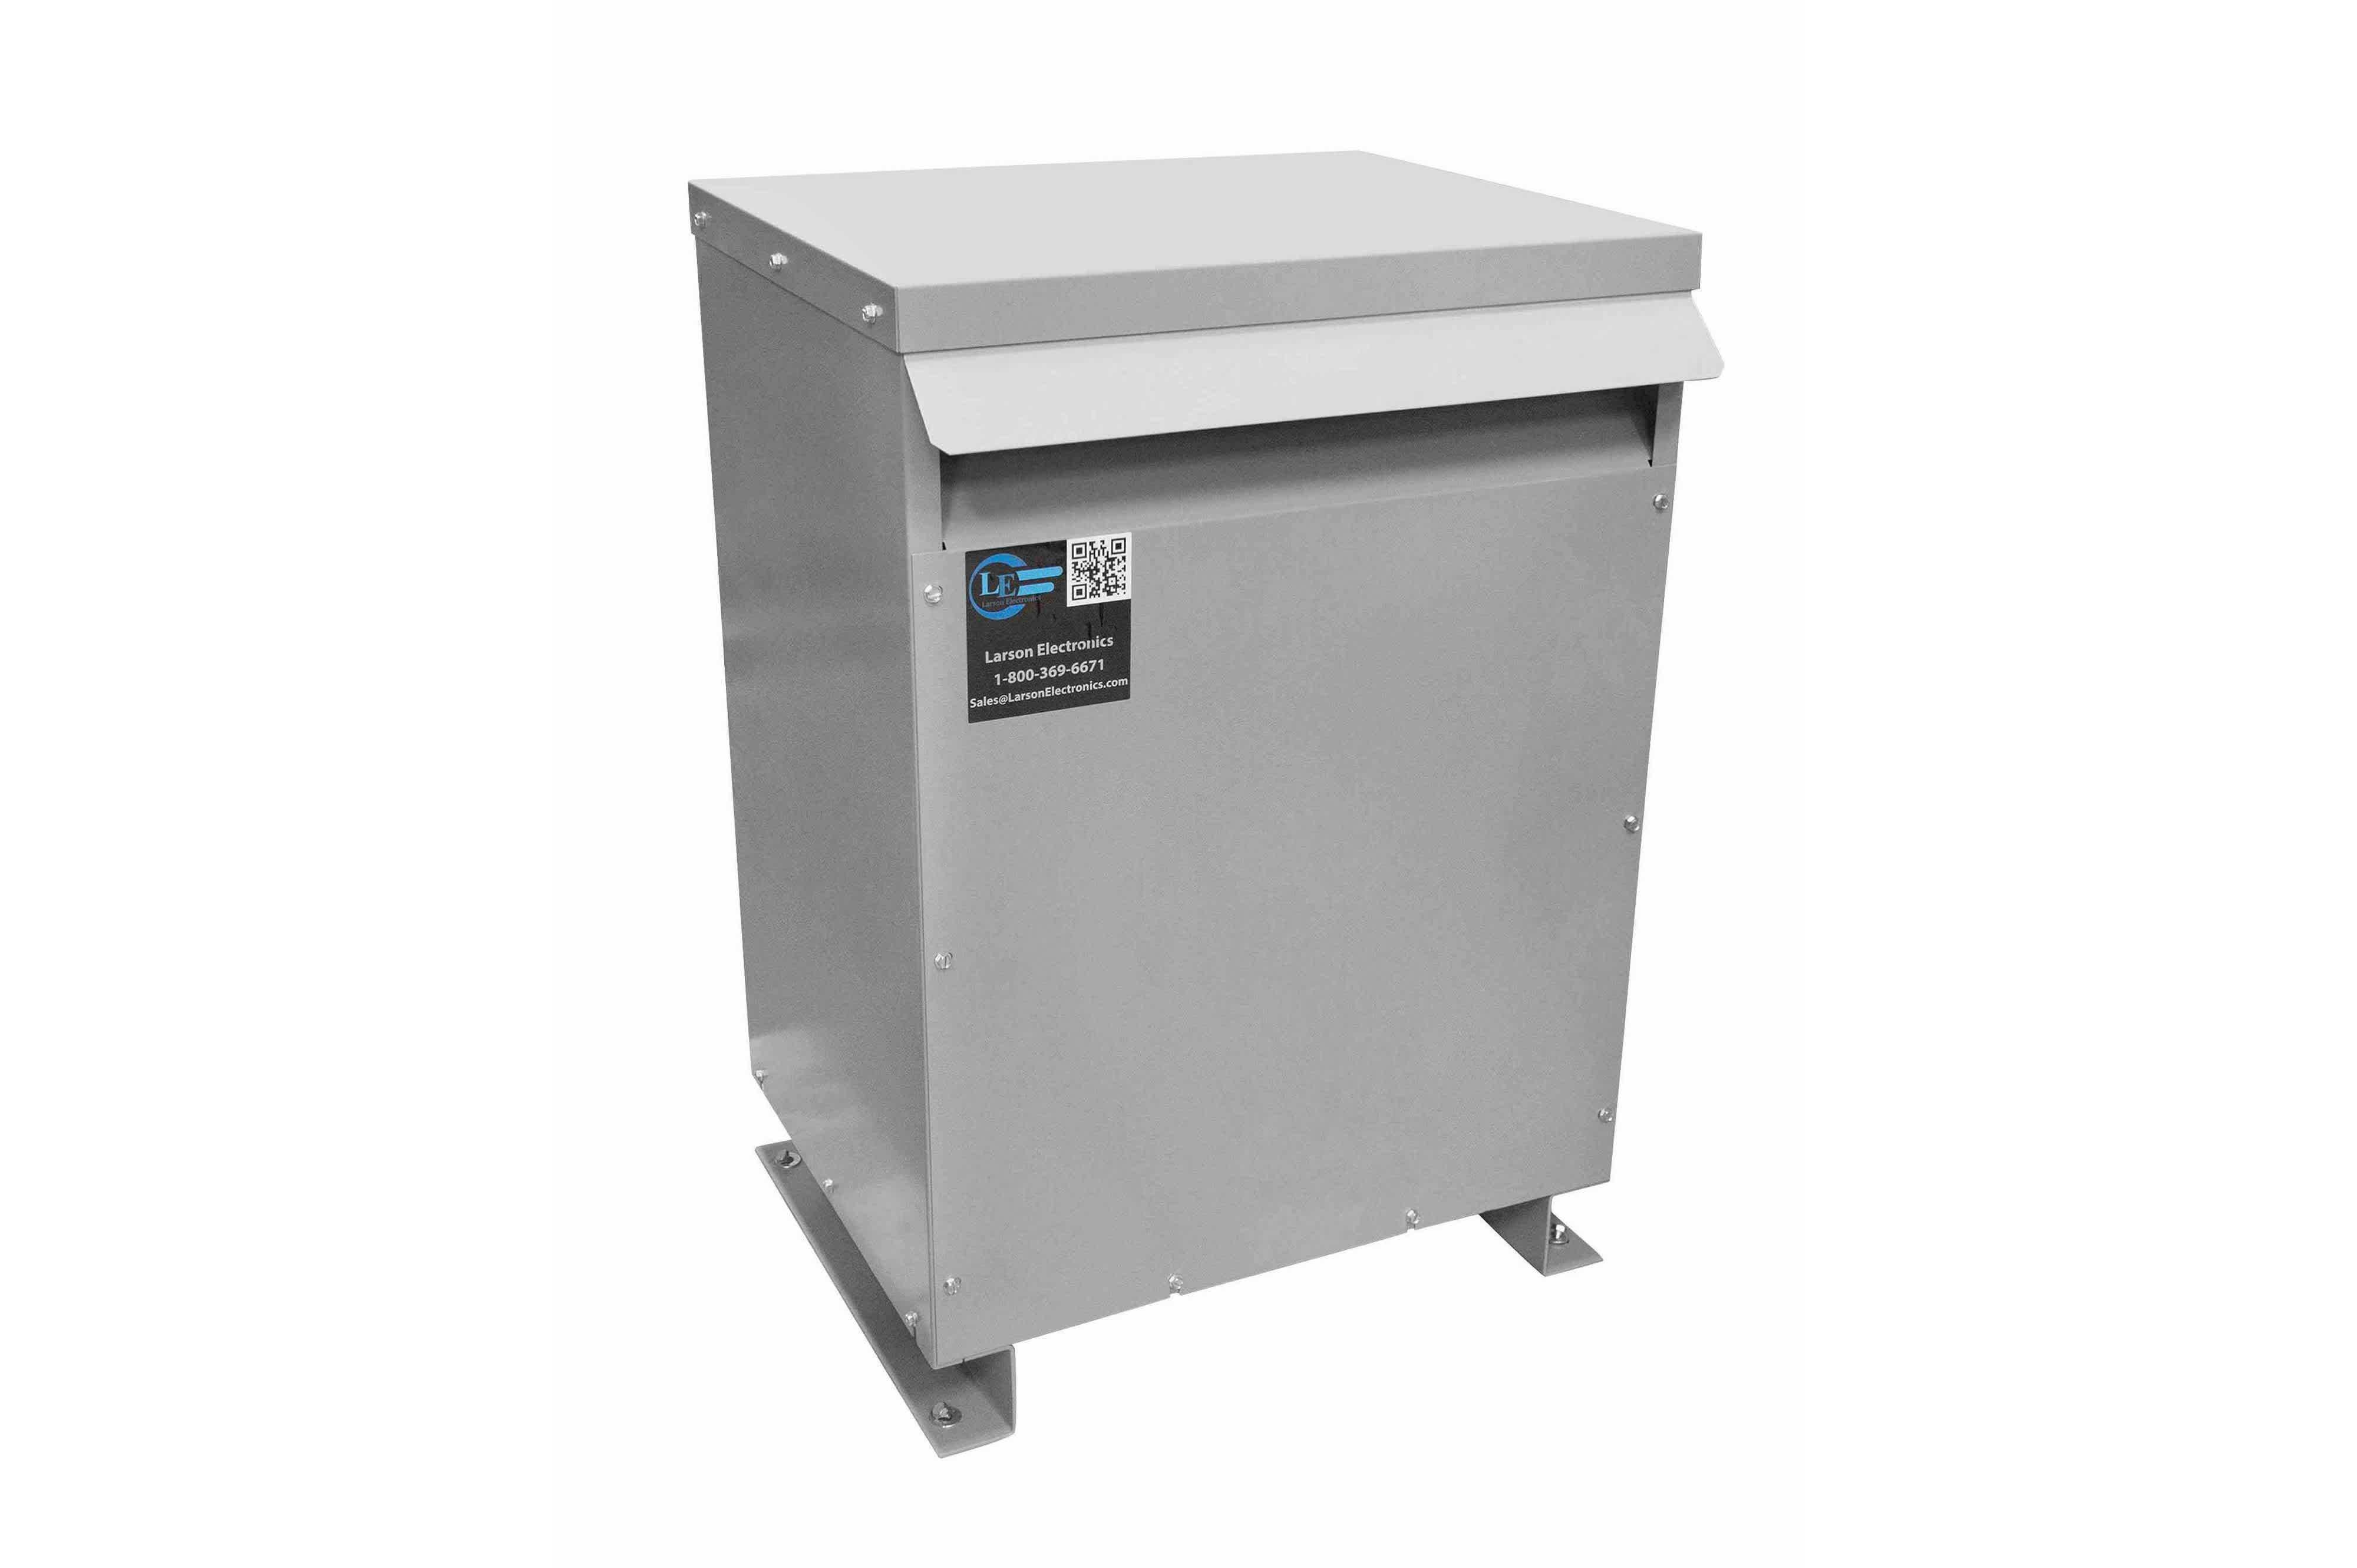 300 kVA 3PH DOE Transformer, 575V Delta Primary, 380Y/220 Wye-N Secondary, N3R, Ventilated, 60 Hz